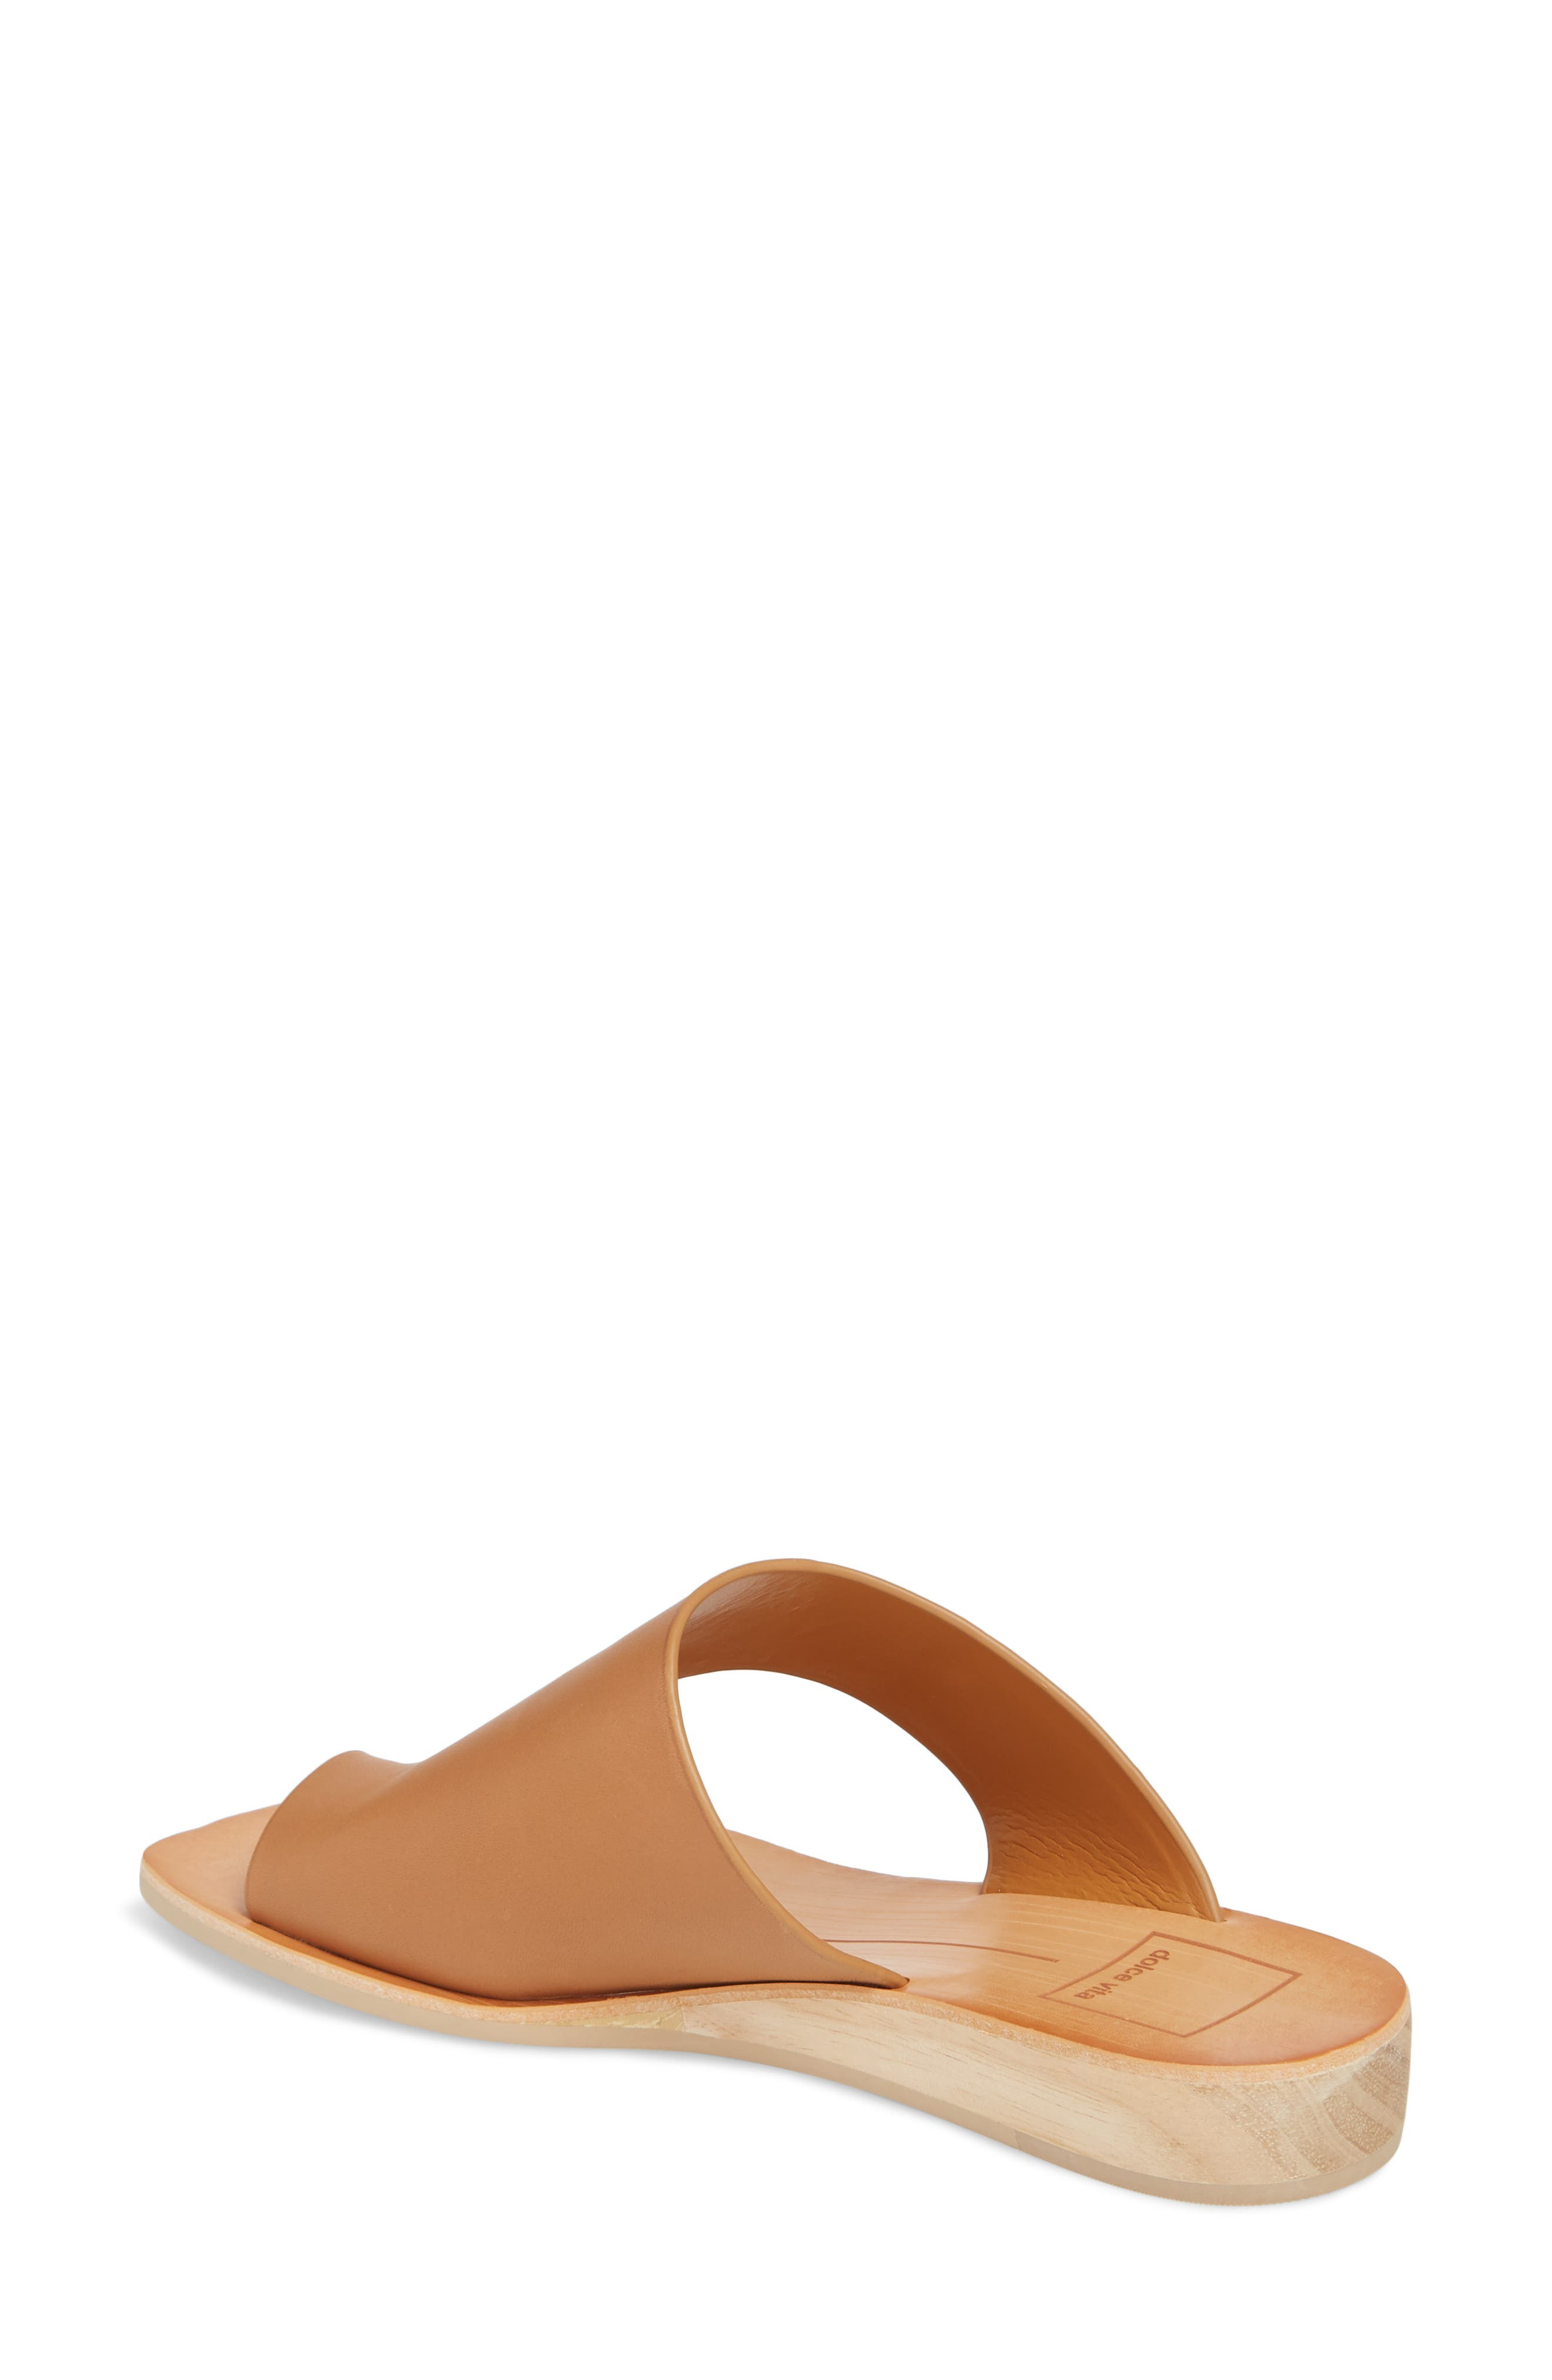 Hazle Asymmetrical Toe Loop Sandal,                             Alternate thumbnail 5, color,